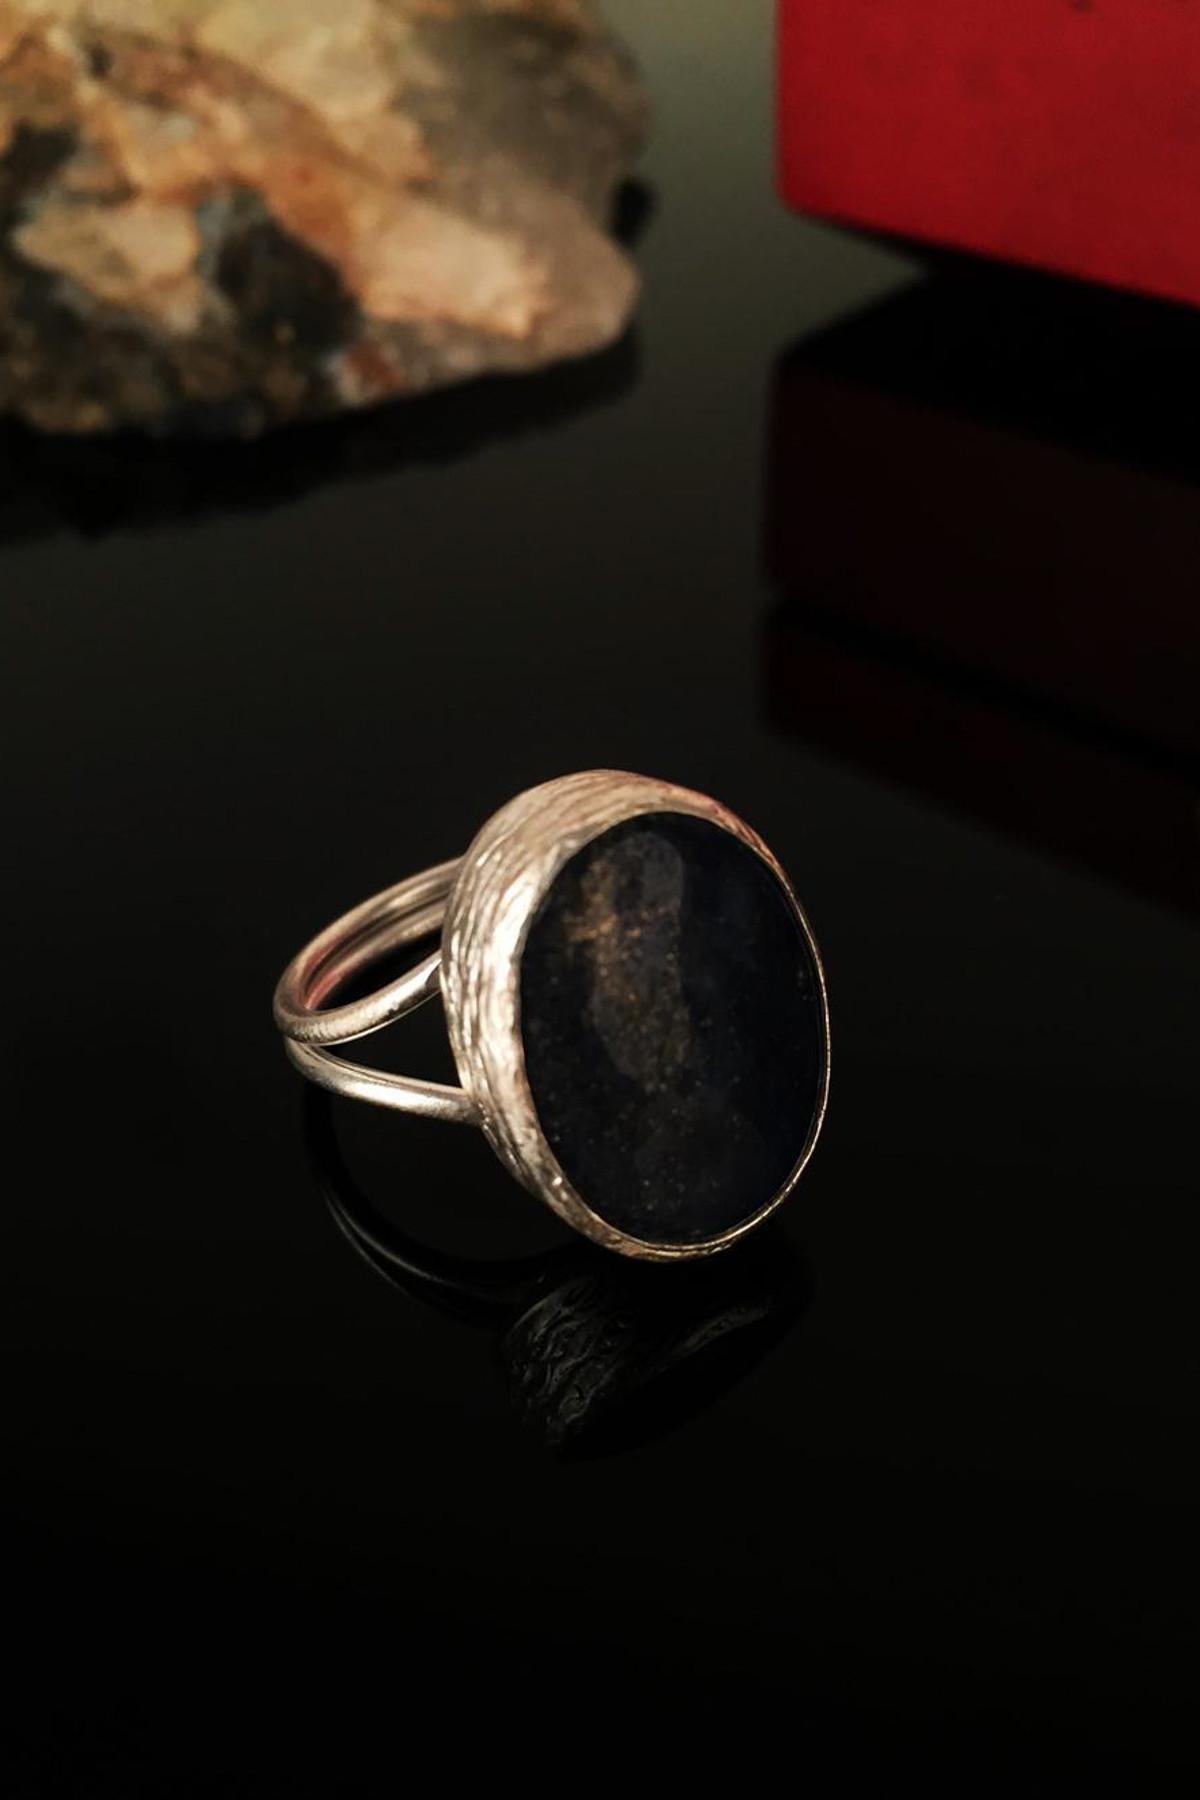 Dr. Stone Kadın Doğaltaş Lapis Lazuli Taşı Gümüş Kaplama Yüzük Krb135 1